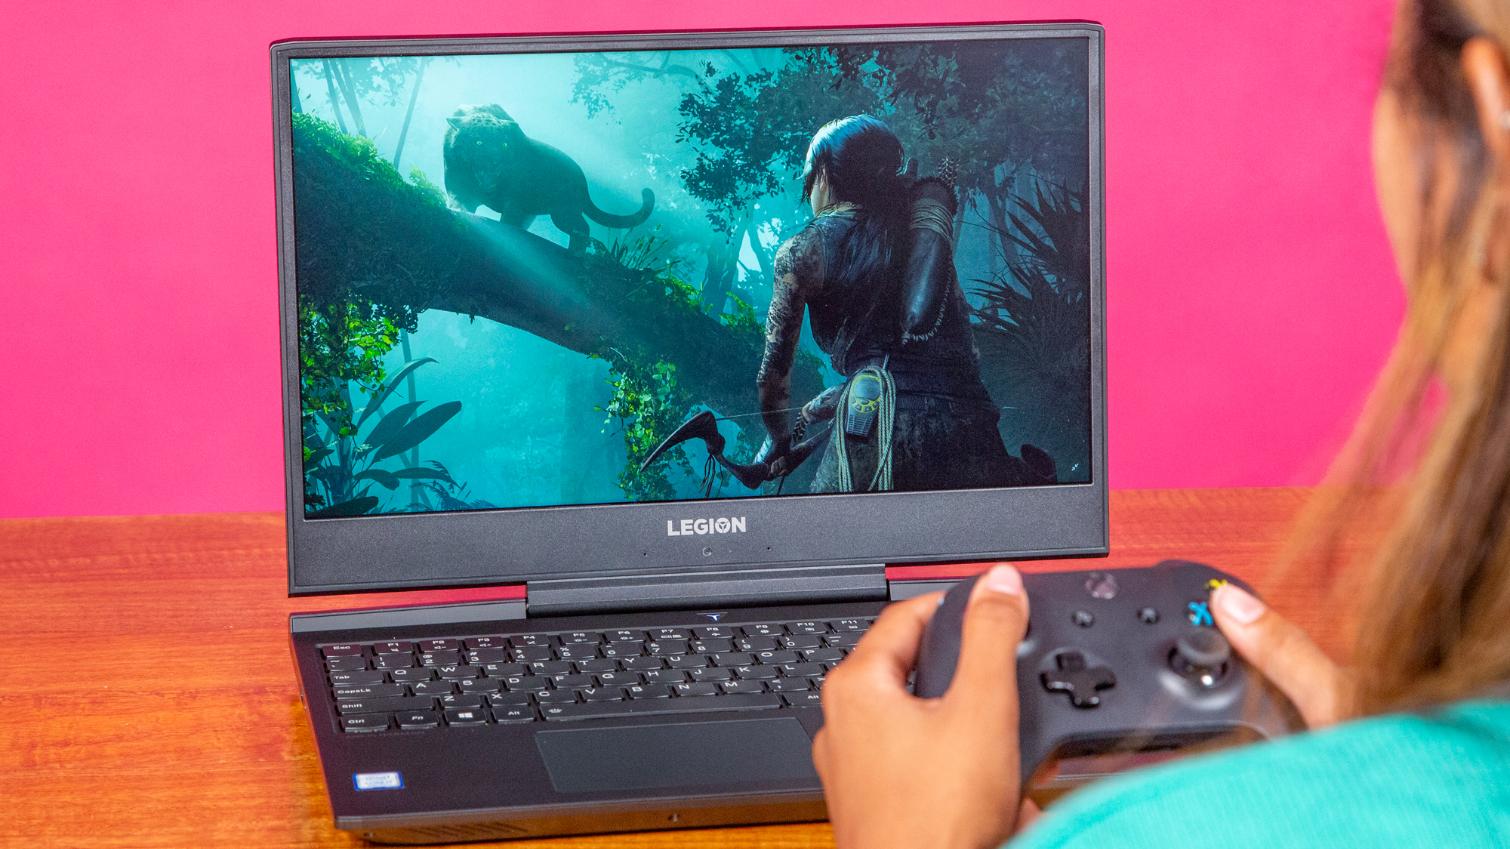 Lenovo Legion Y545 Laptop Review Glam Free Gaming Tom S Hardware Tom S Hardware